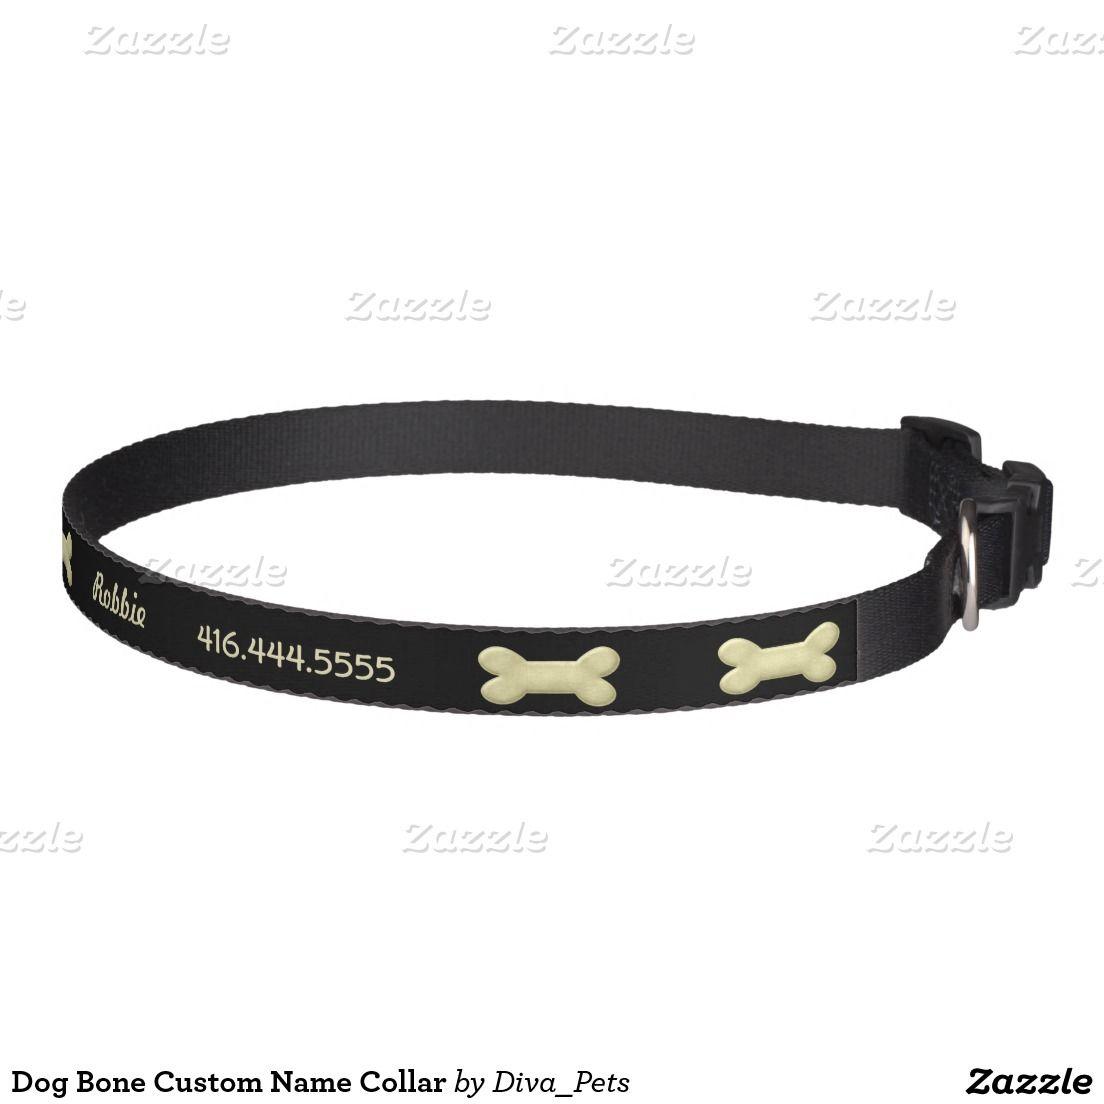 Dog Bone Custom Name Collar Dog Collars